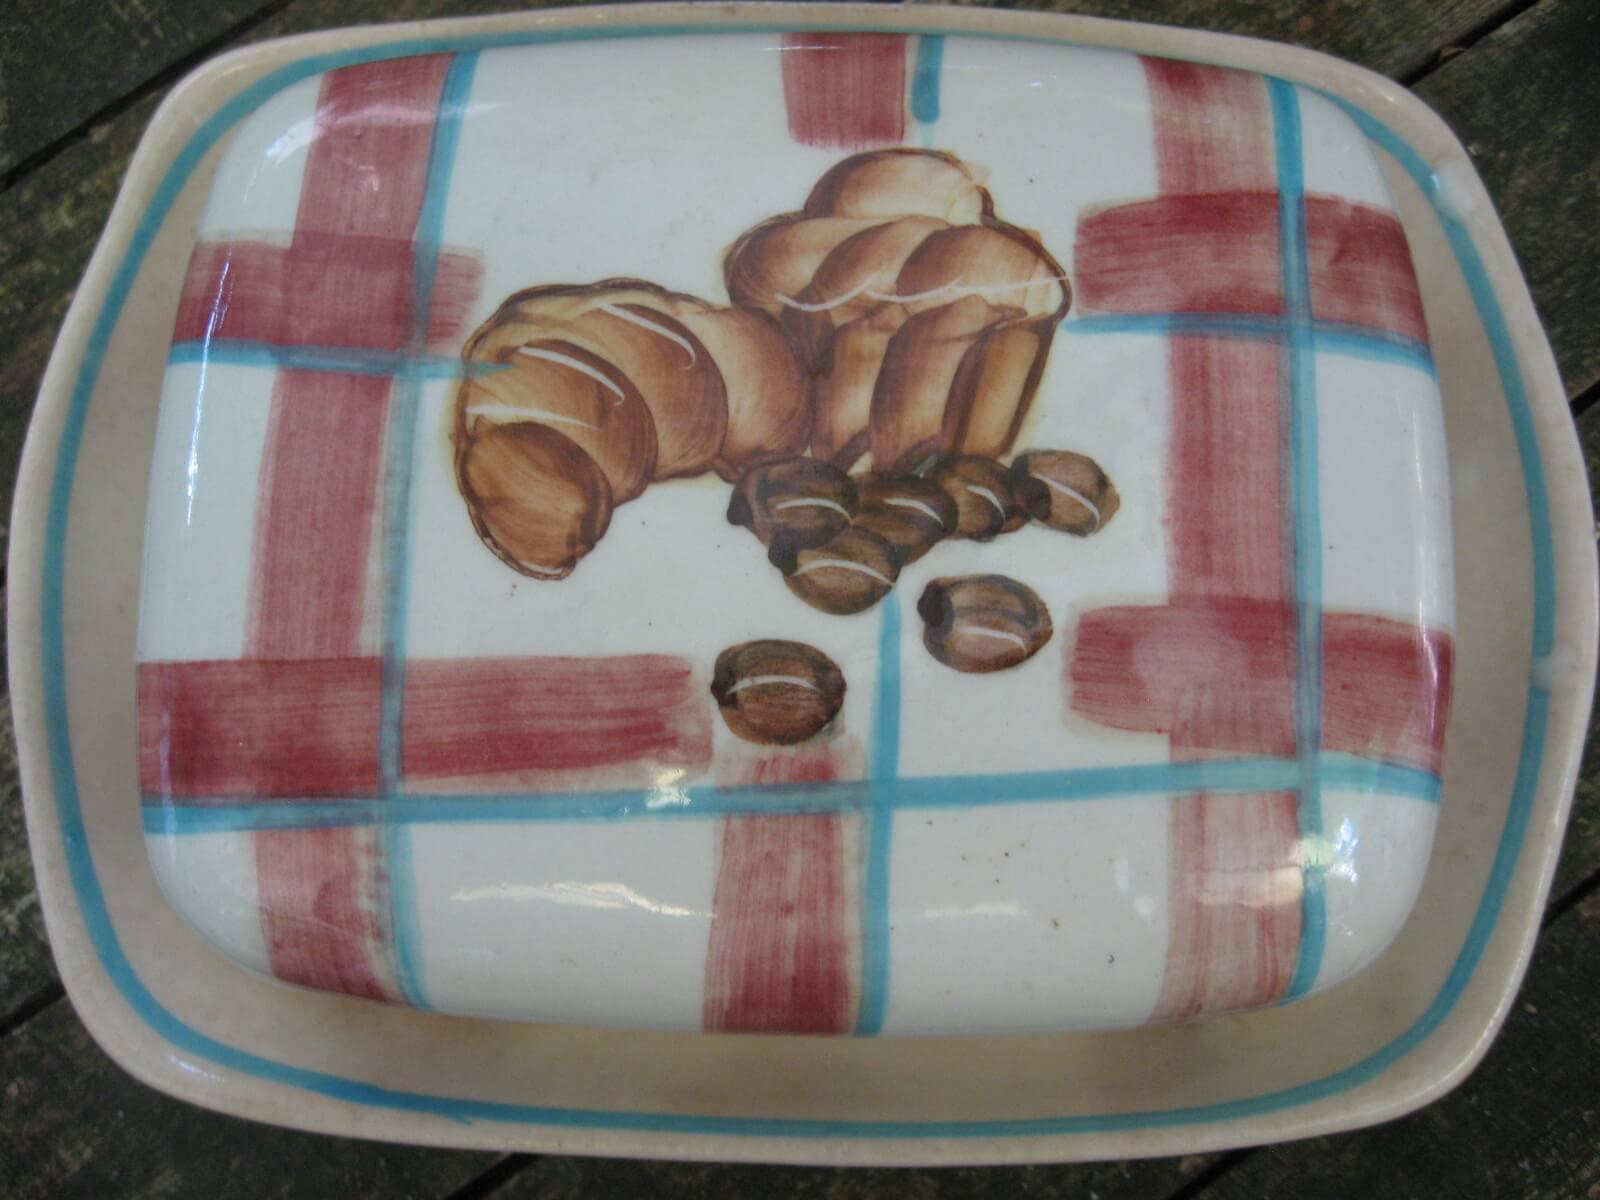 Butter dish croissat coffee country at PumpjackPiddlewick